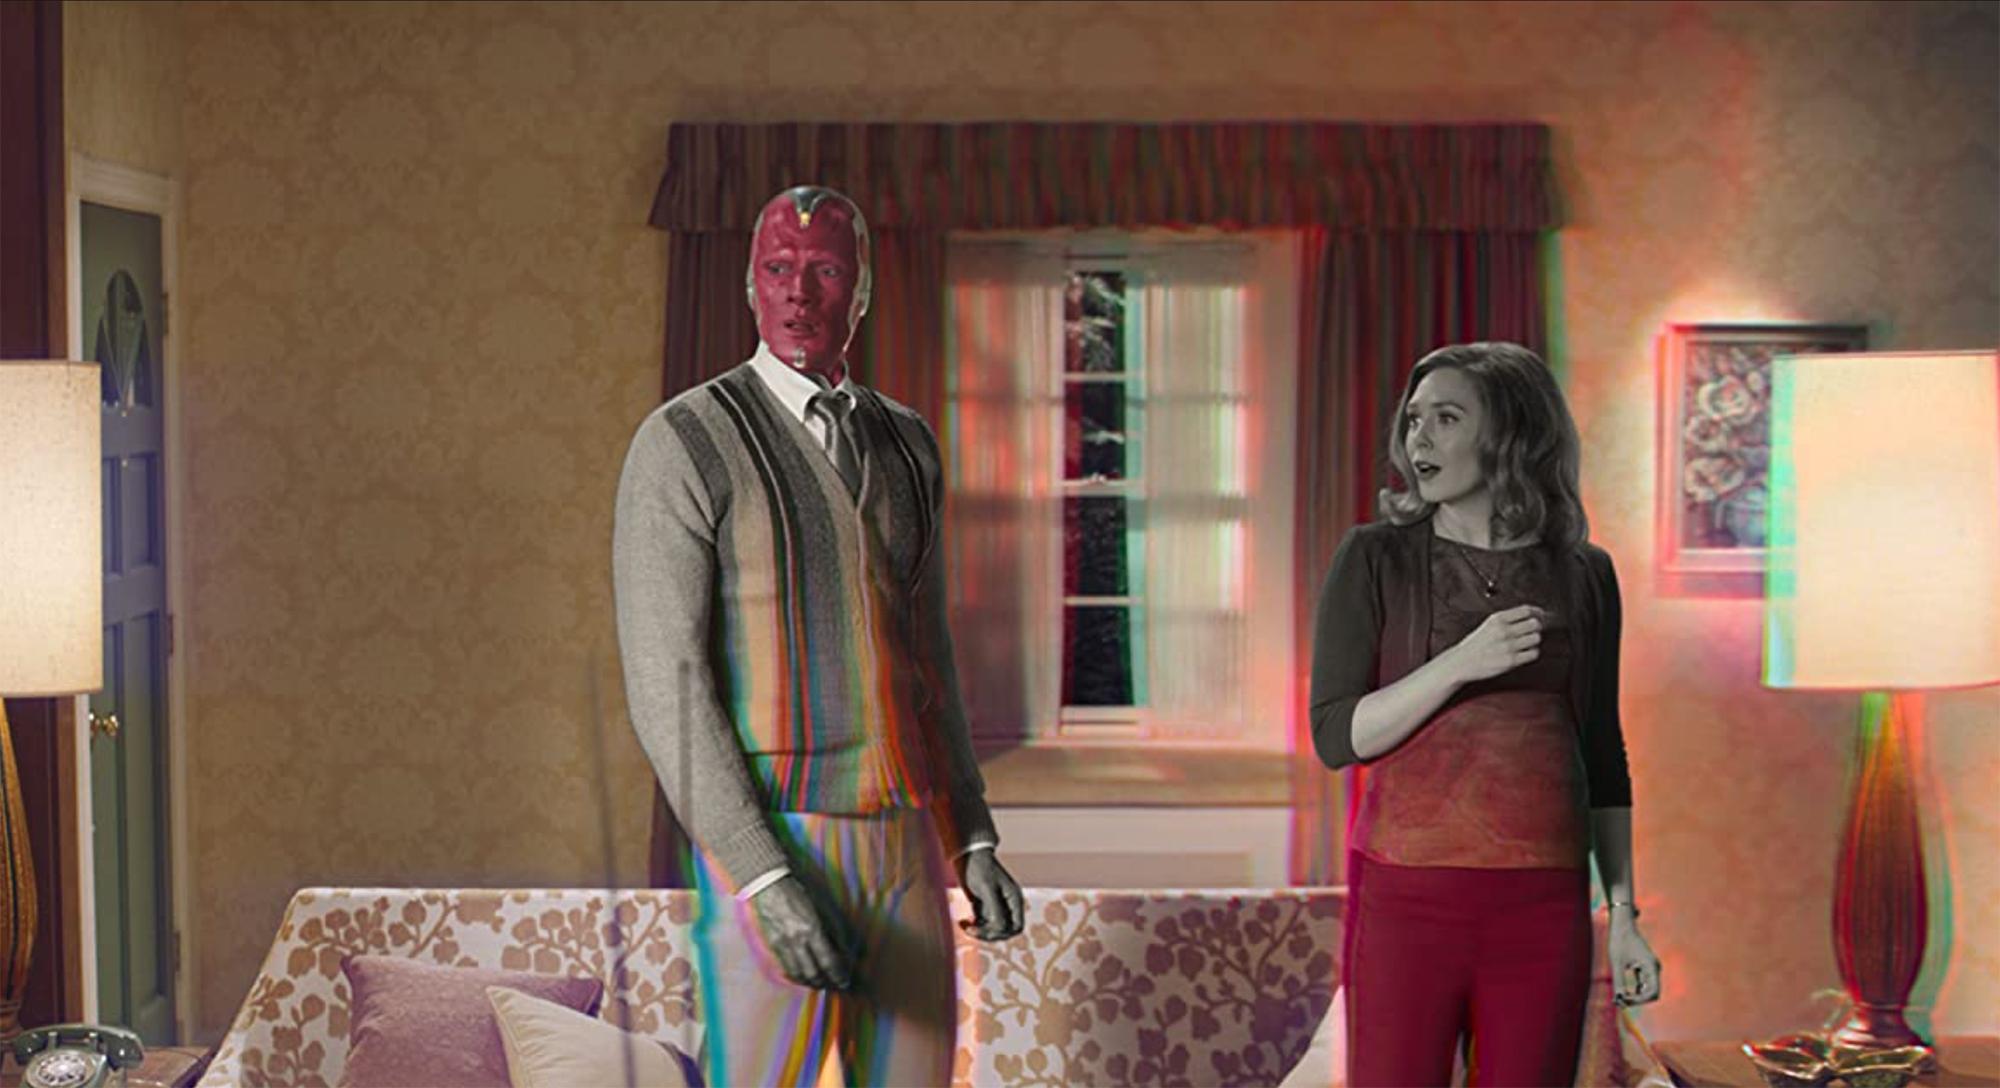 Marvel's 'WandaVision' looks to make Disney+ even mightier